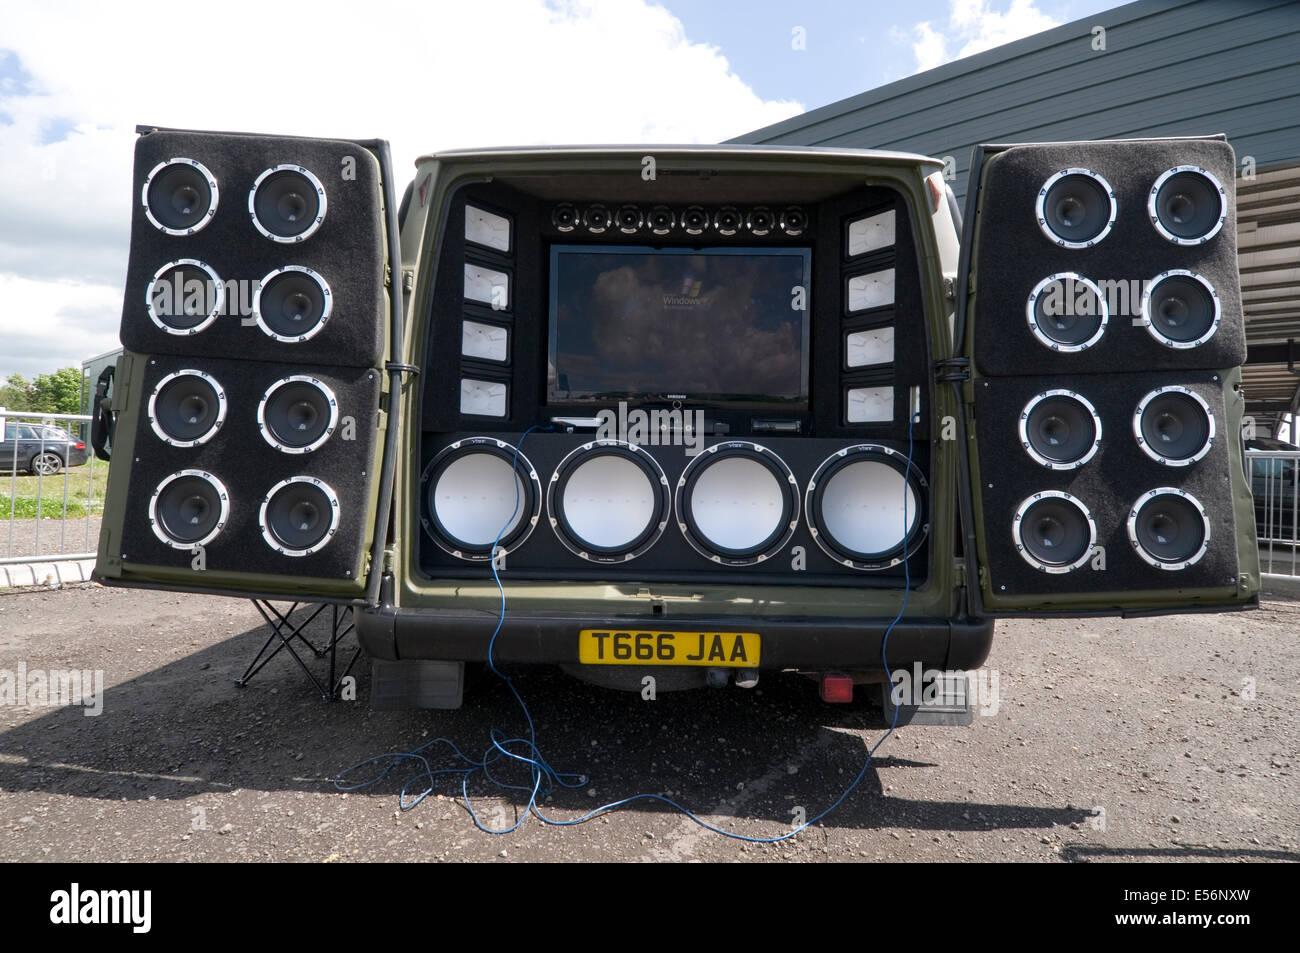 hight resolution of loud car stereo stereos music bass speaker speakers in car entertainment chav sub woofer treble tweeter tweeters speakers db s d